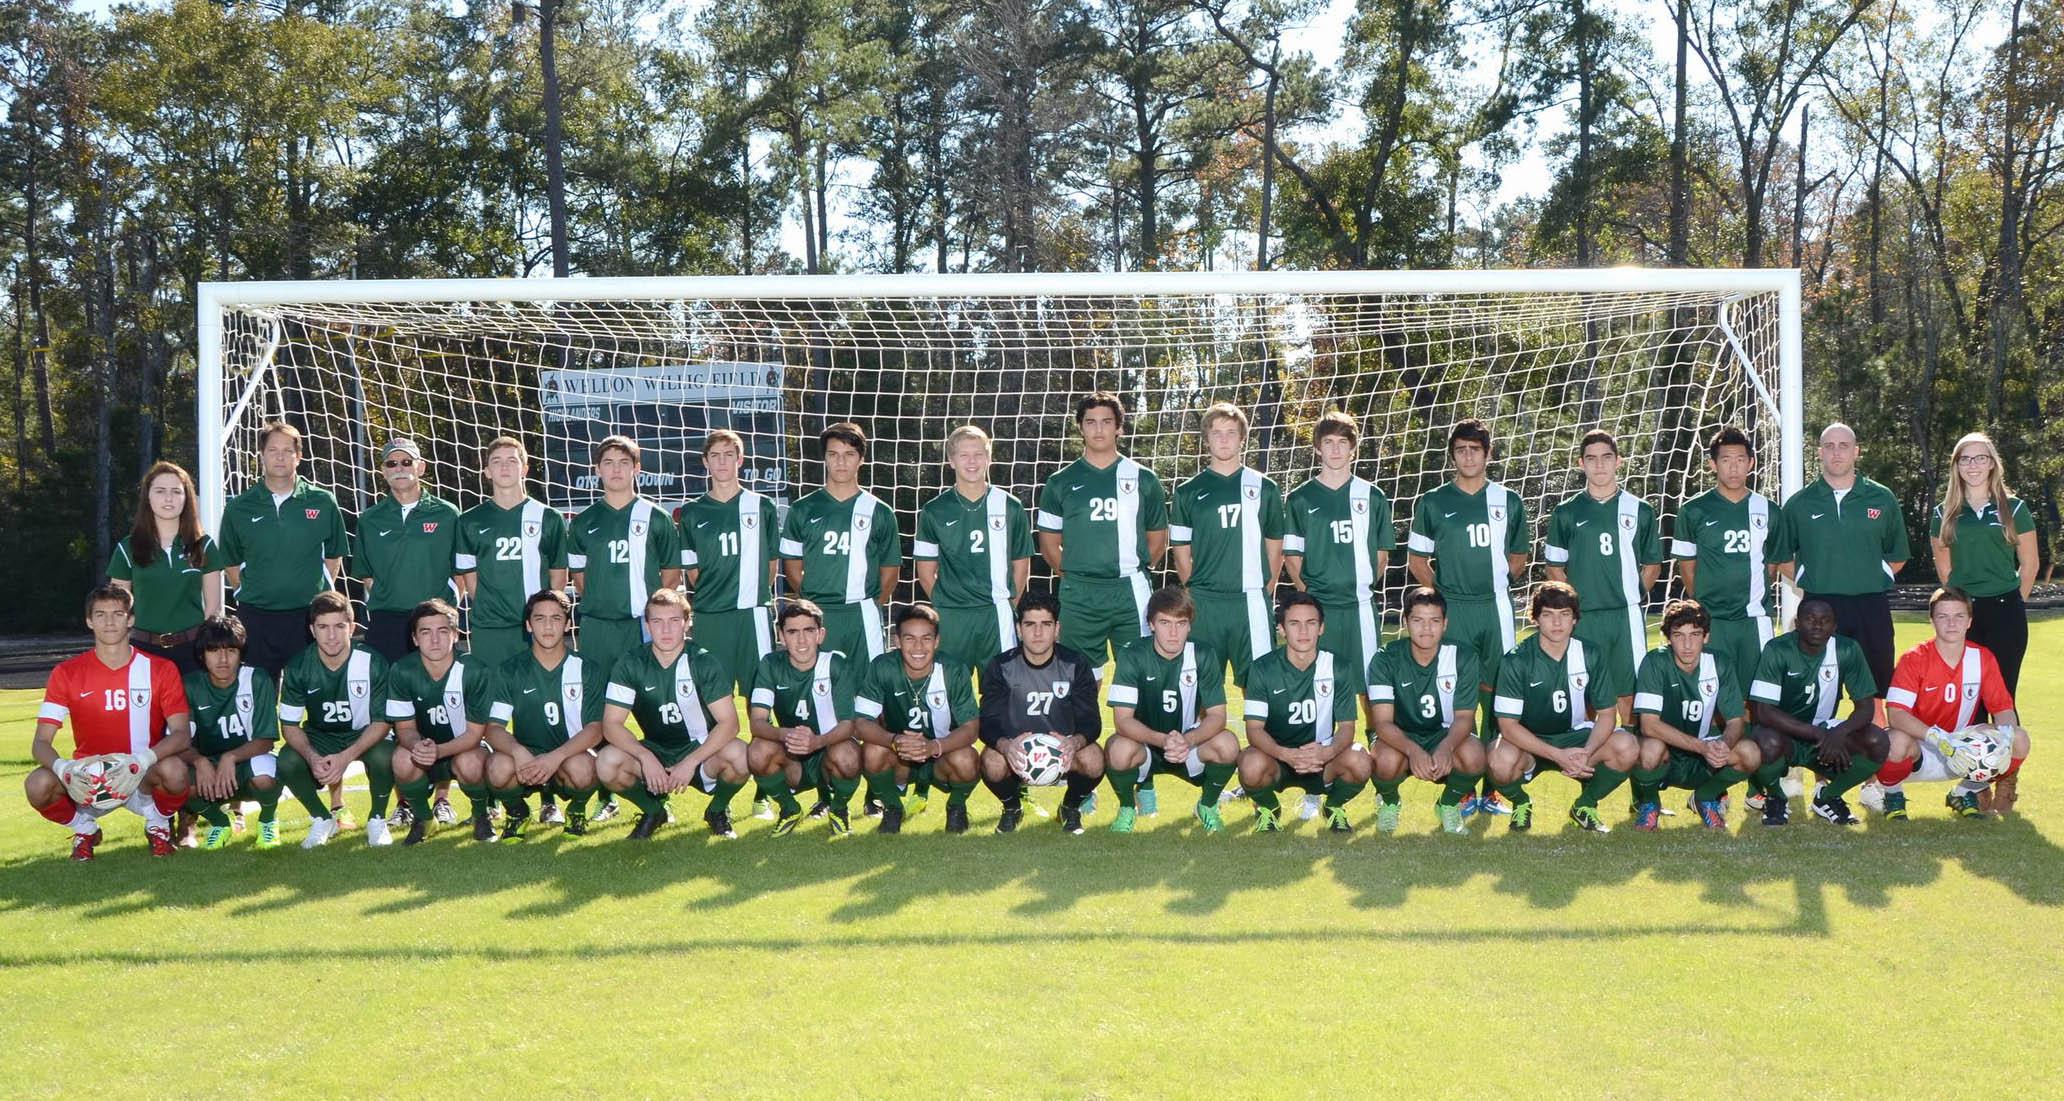 Varsity Team Picture